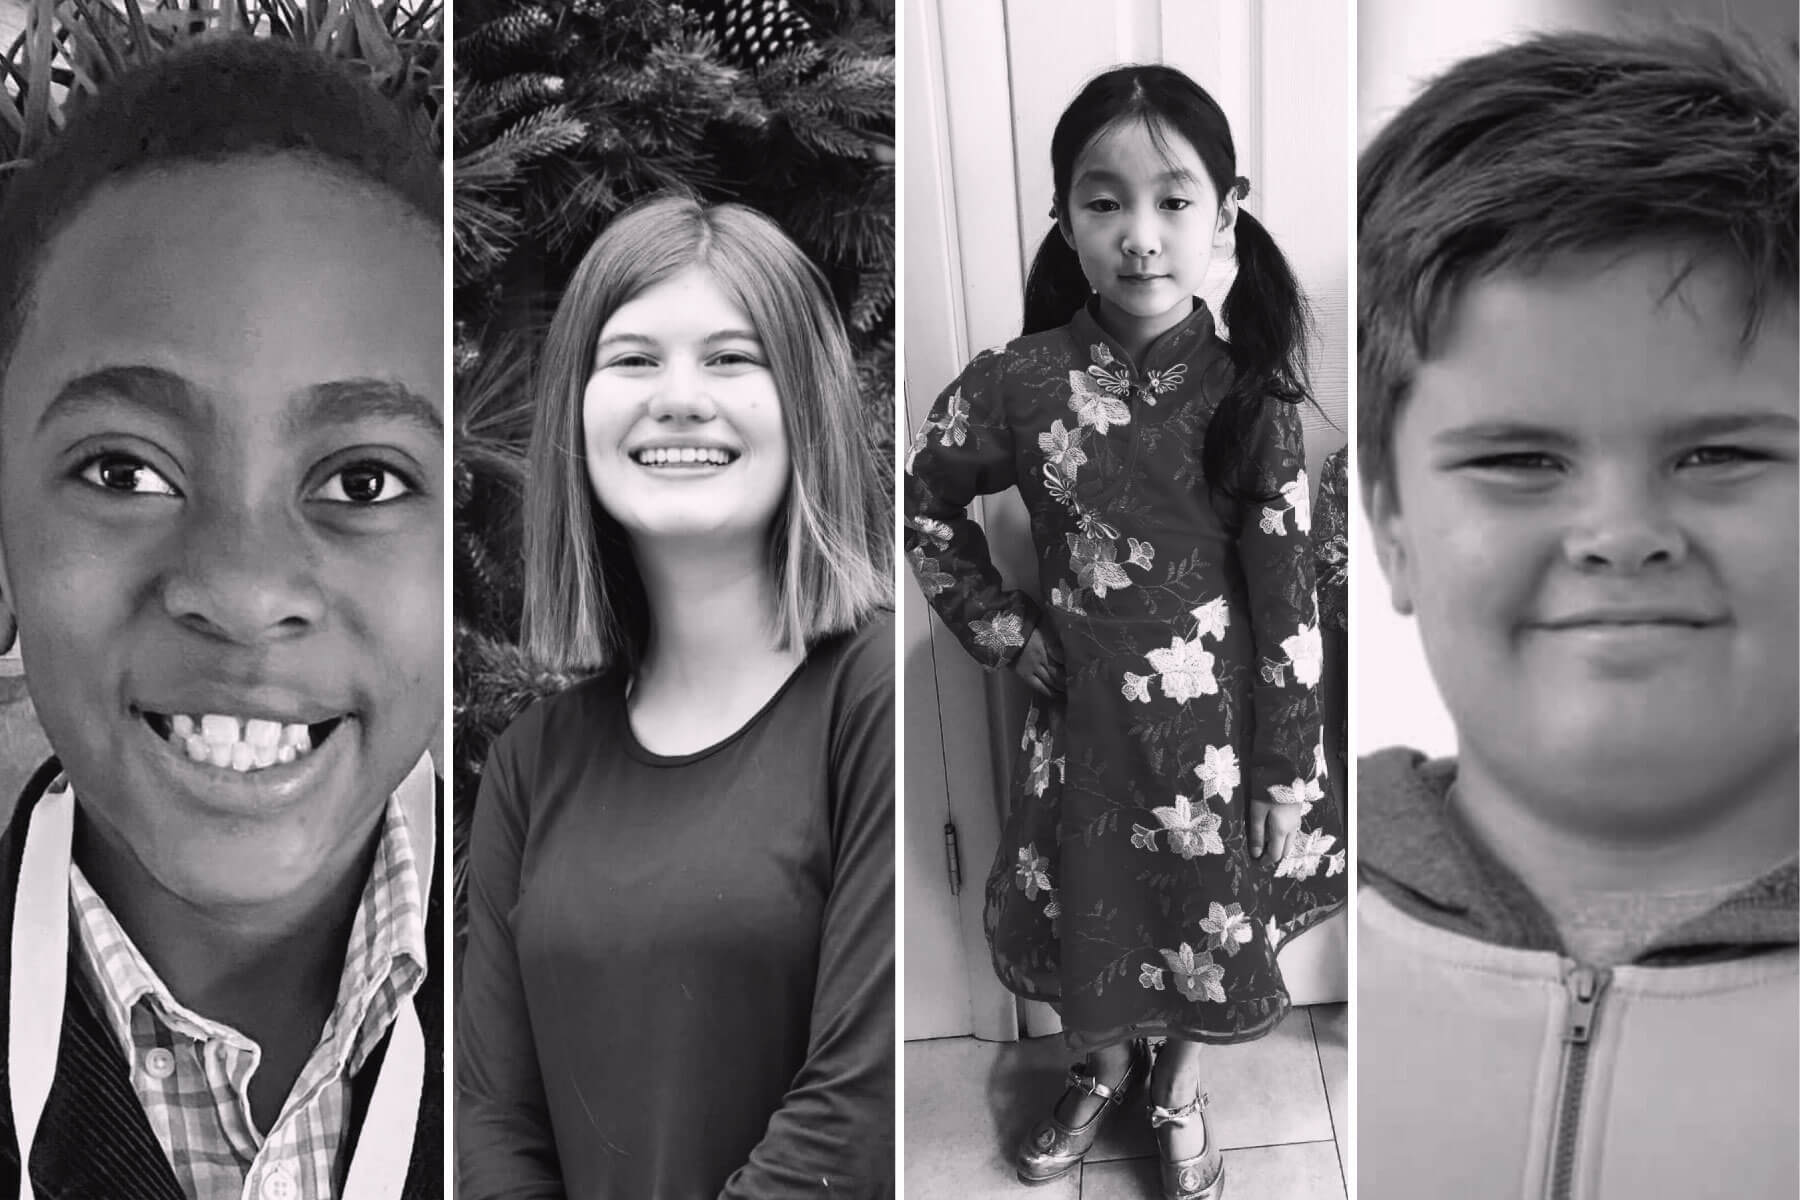 portraits of four kids